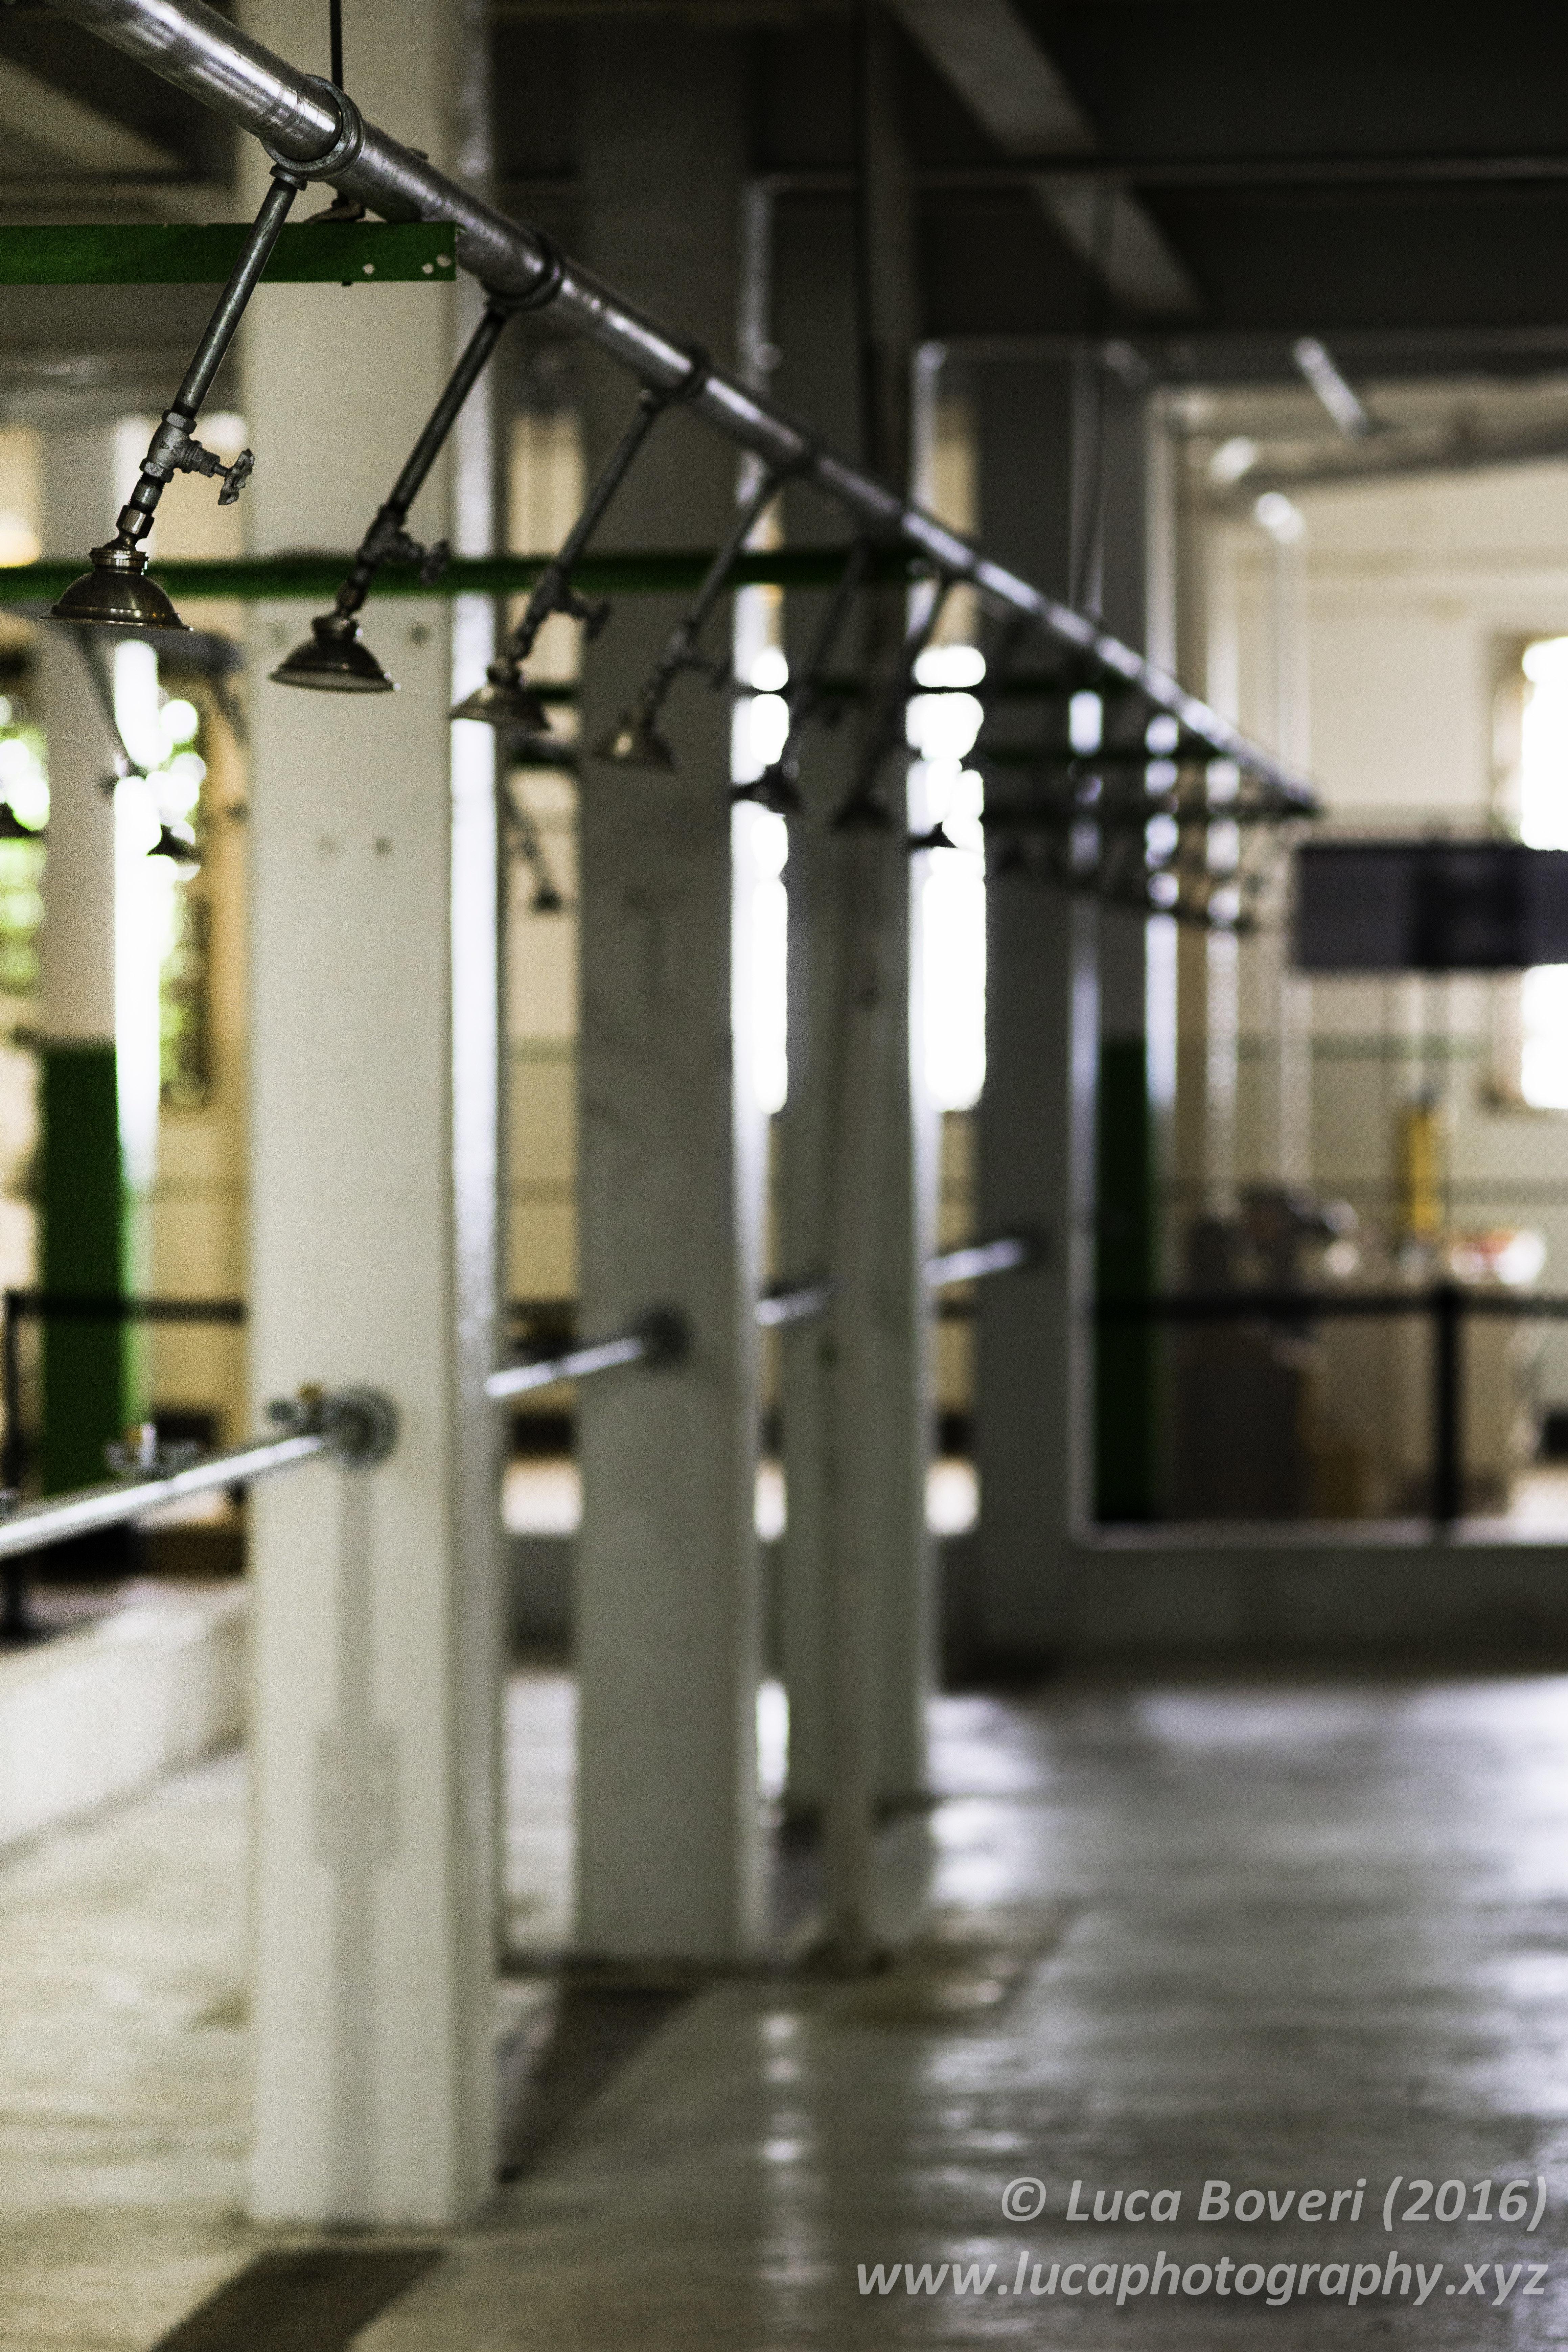 Alcatraz prison showers. @lucaboveri